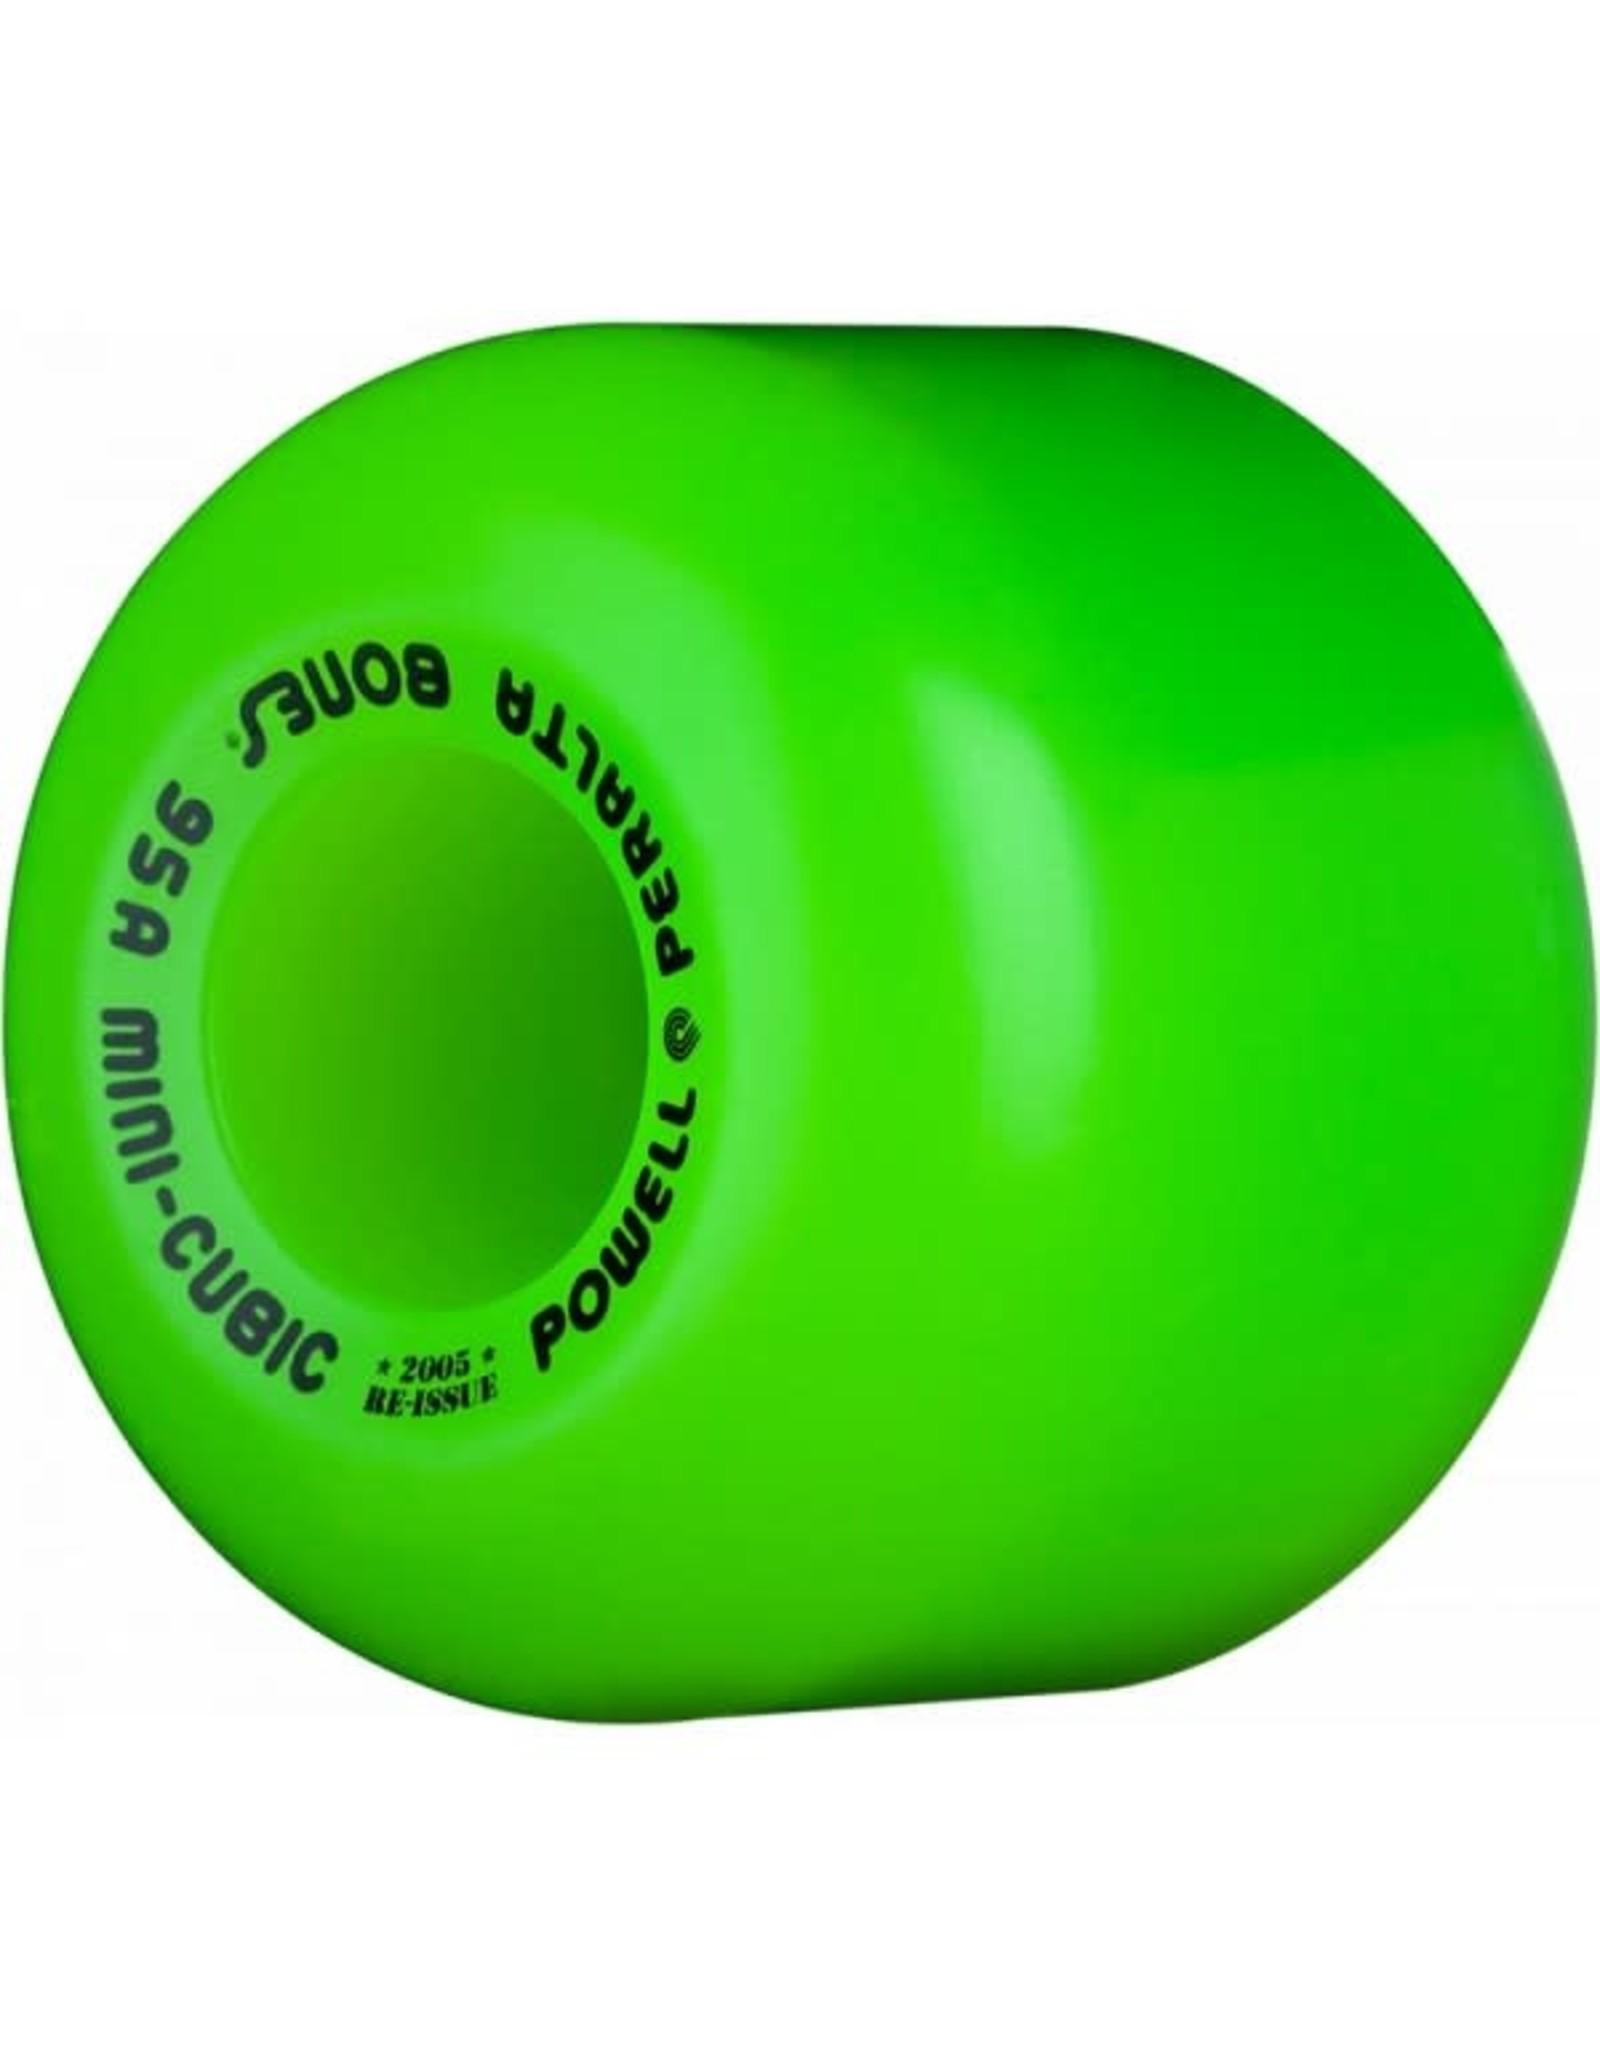 Powell Peralta Powell Peralta Mini Cubics Green Wheel 95A 64mm